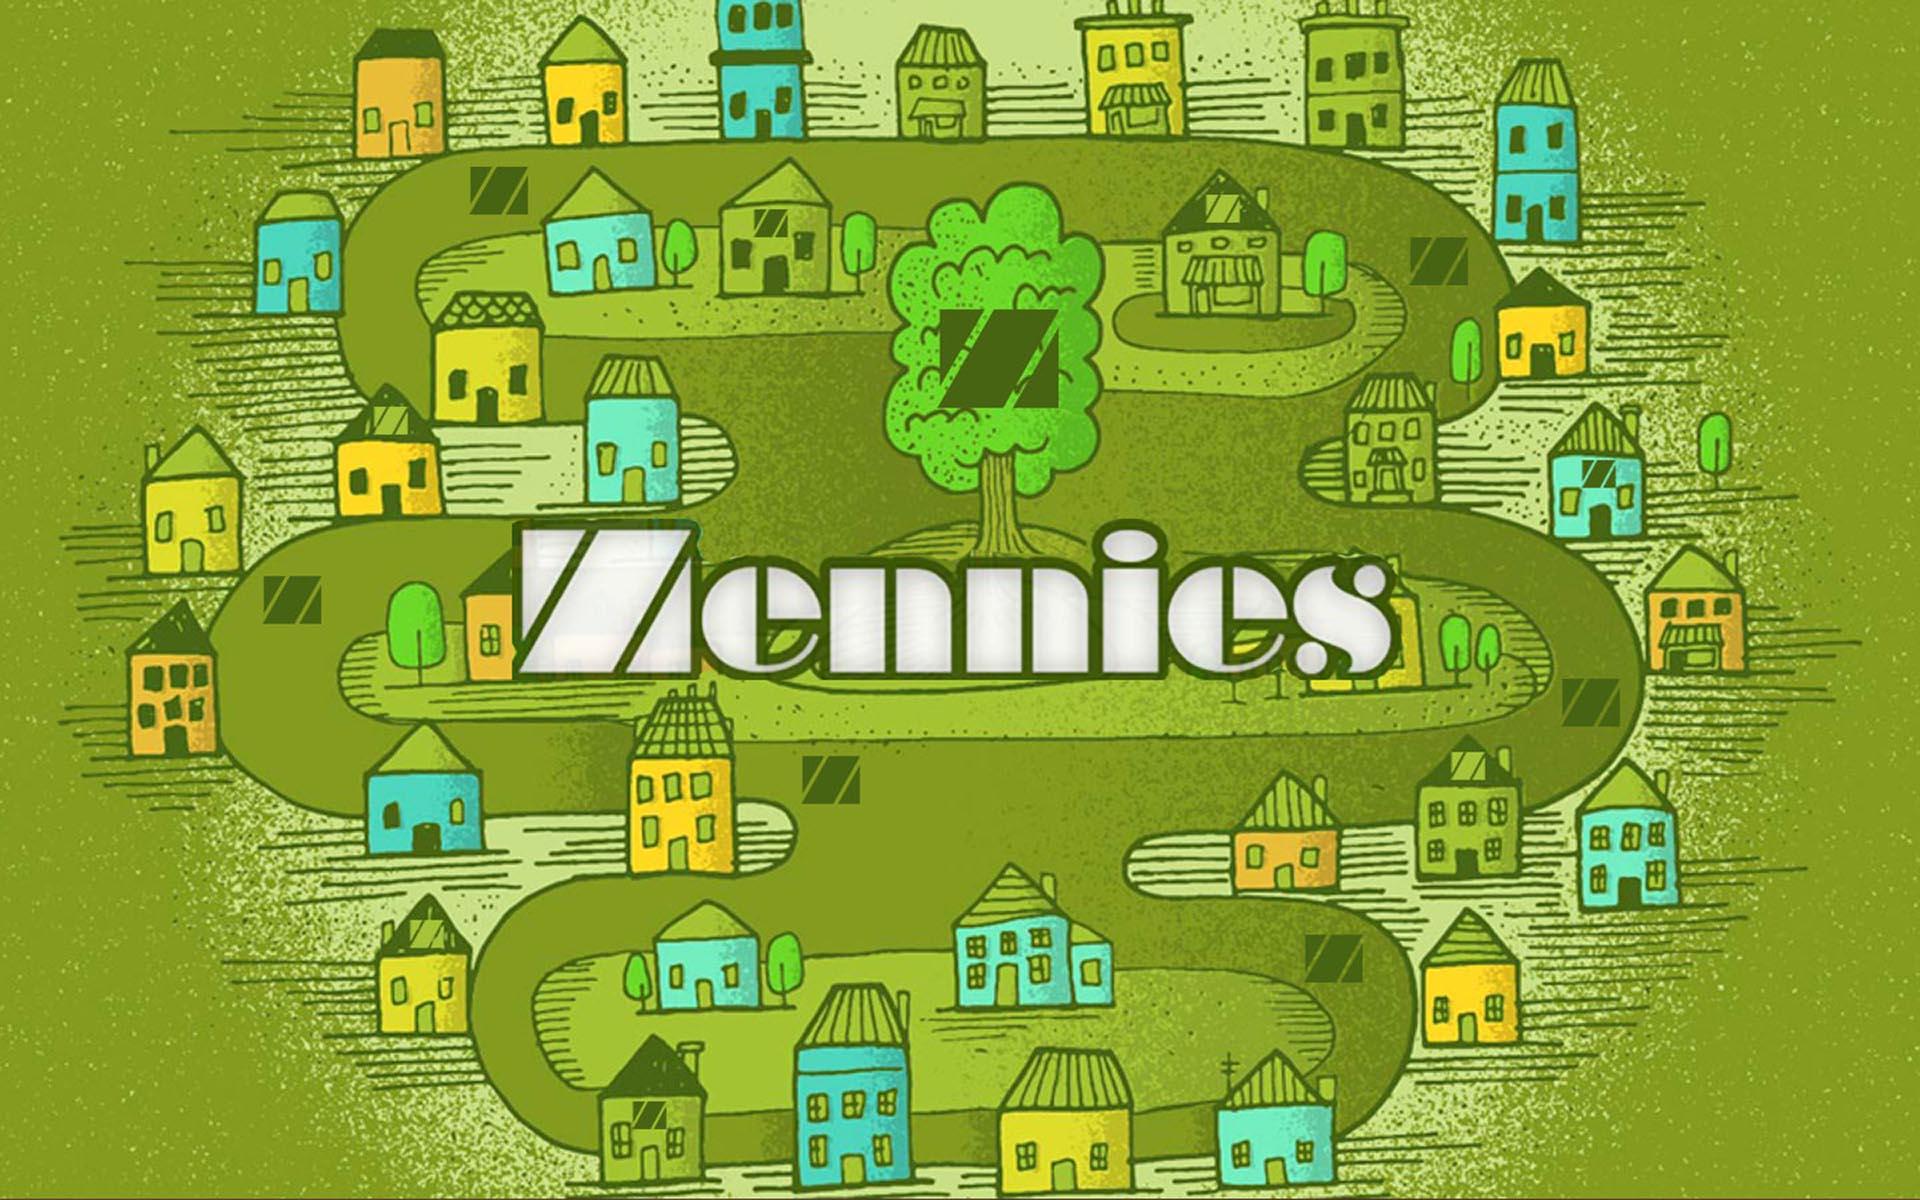 ZENI Group Creates Community Building Initiative Through Zennies Ambassador Program